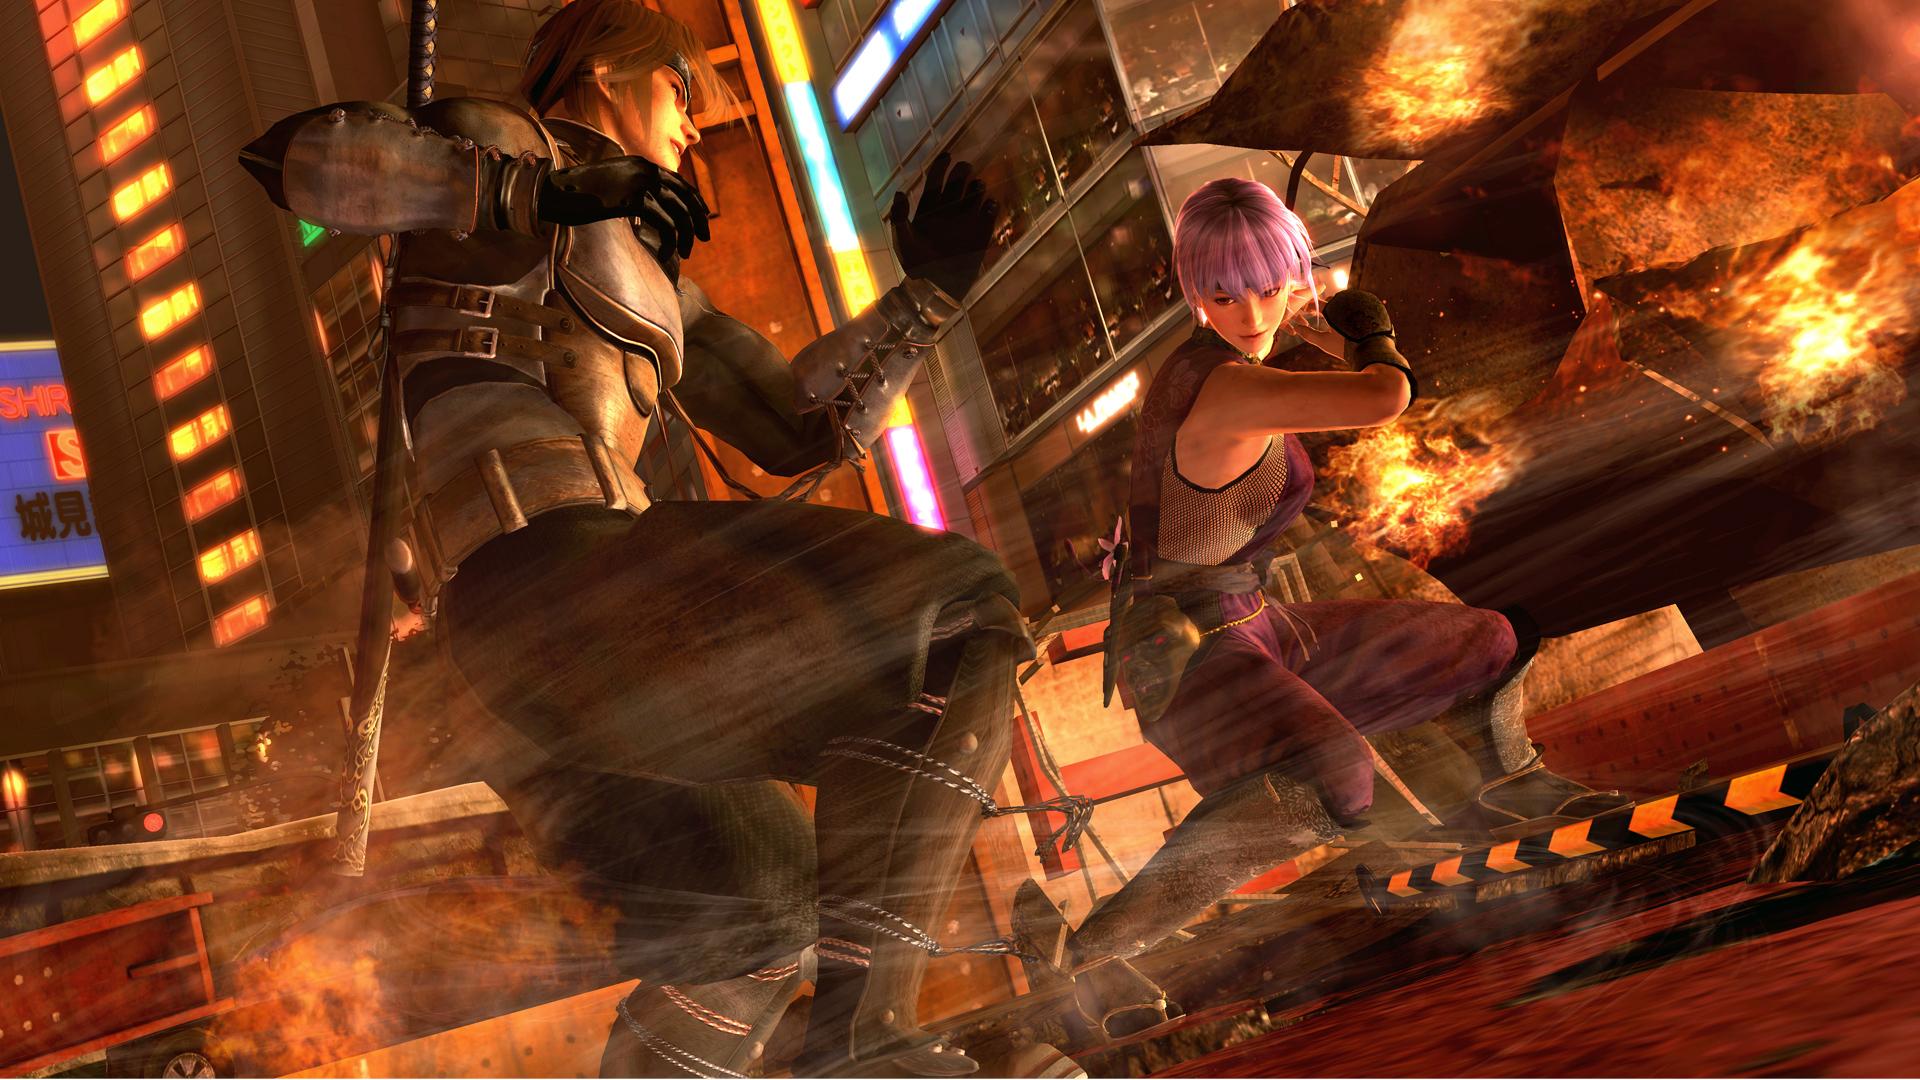 Dead Or Alive 5 Last Round ESPAÑOL PC Full (RELOADED) 5